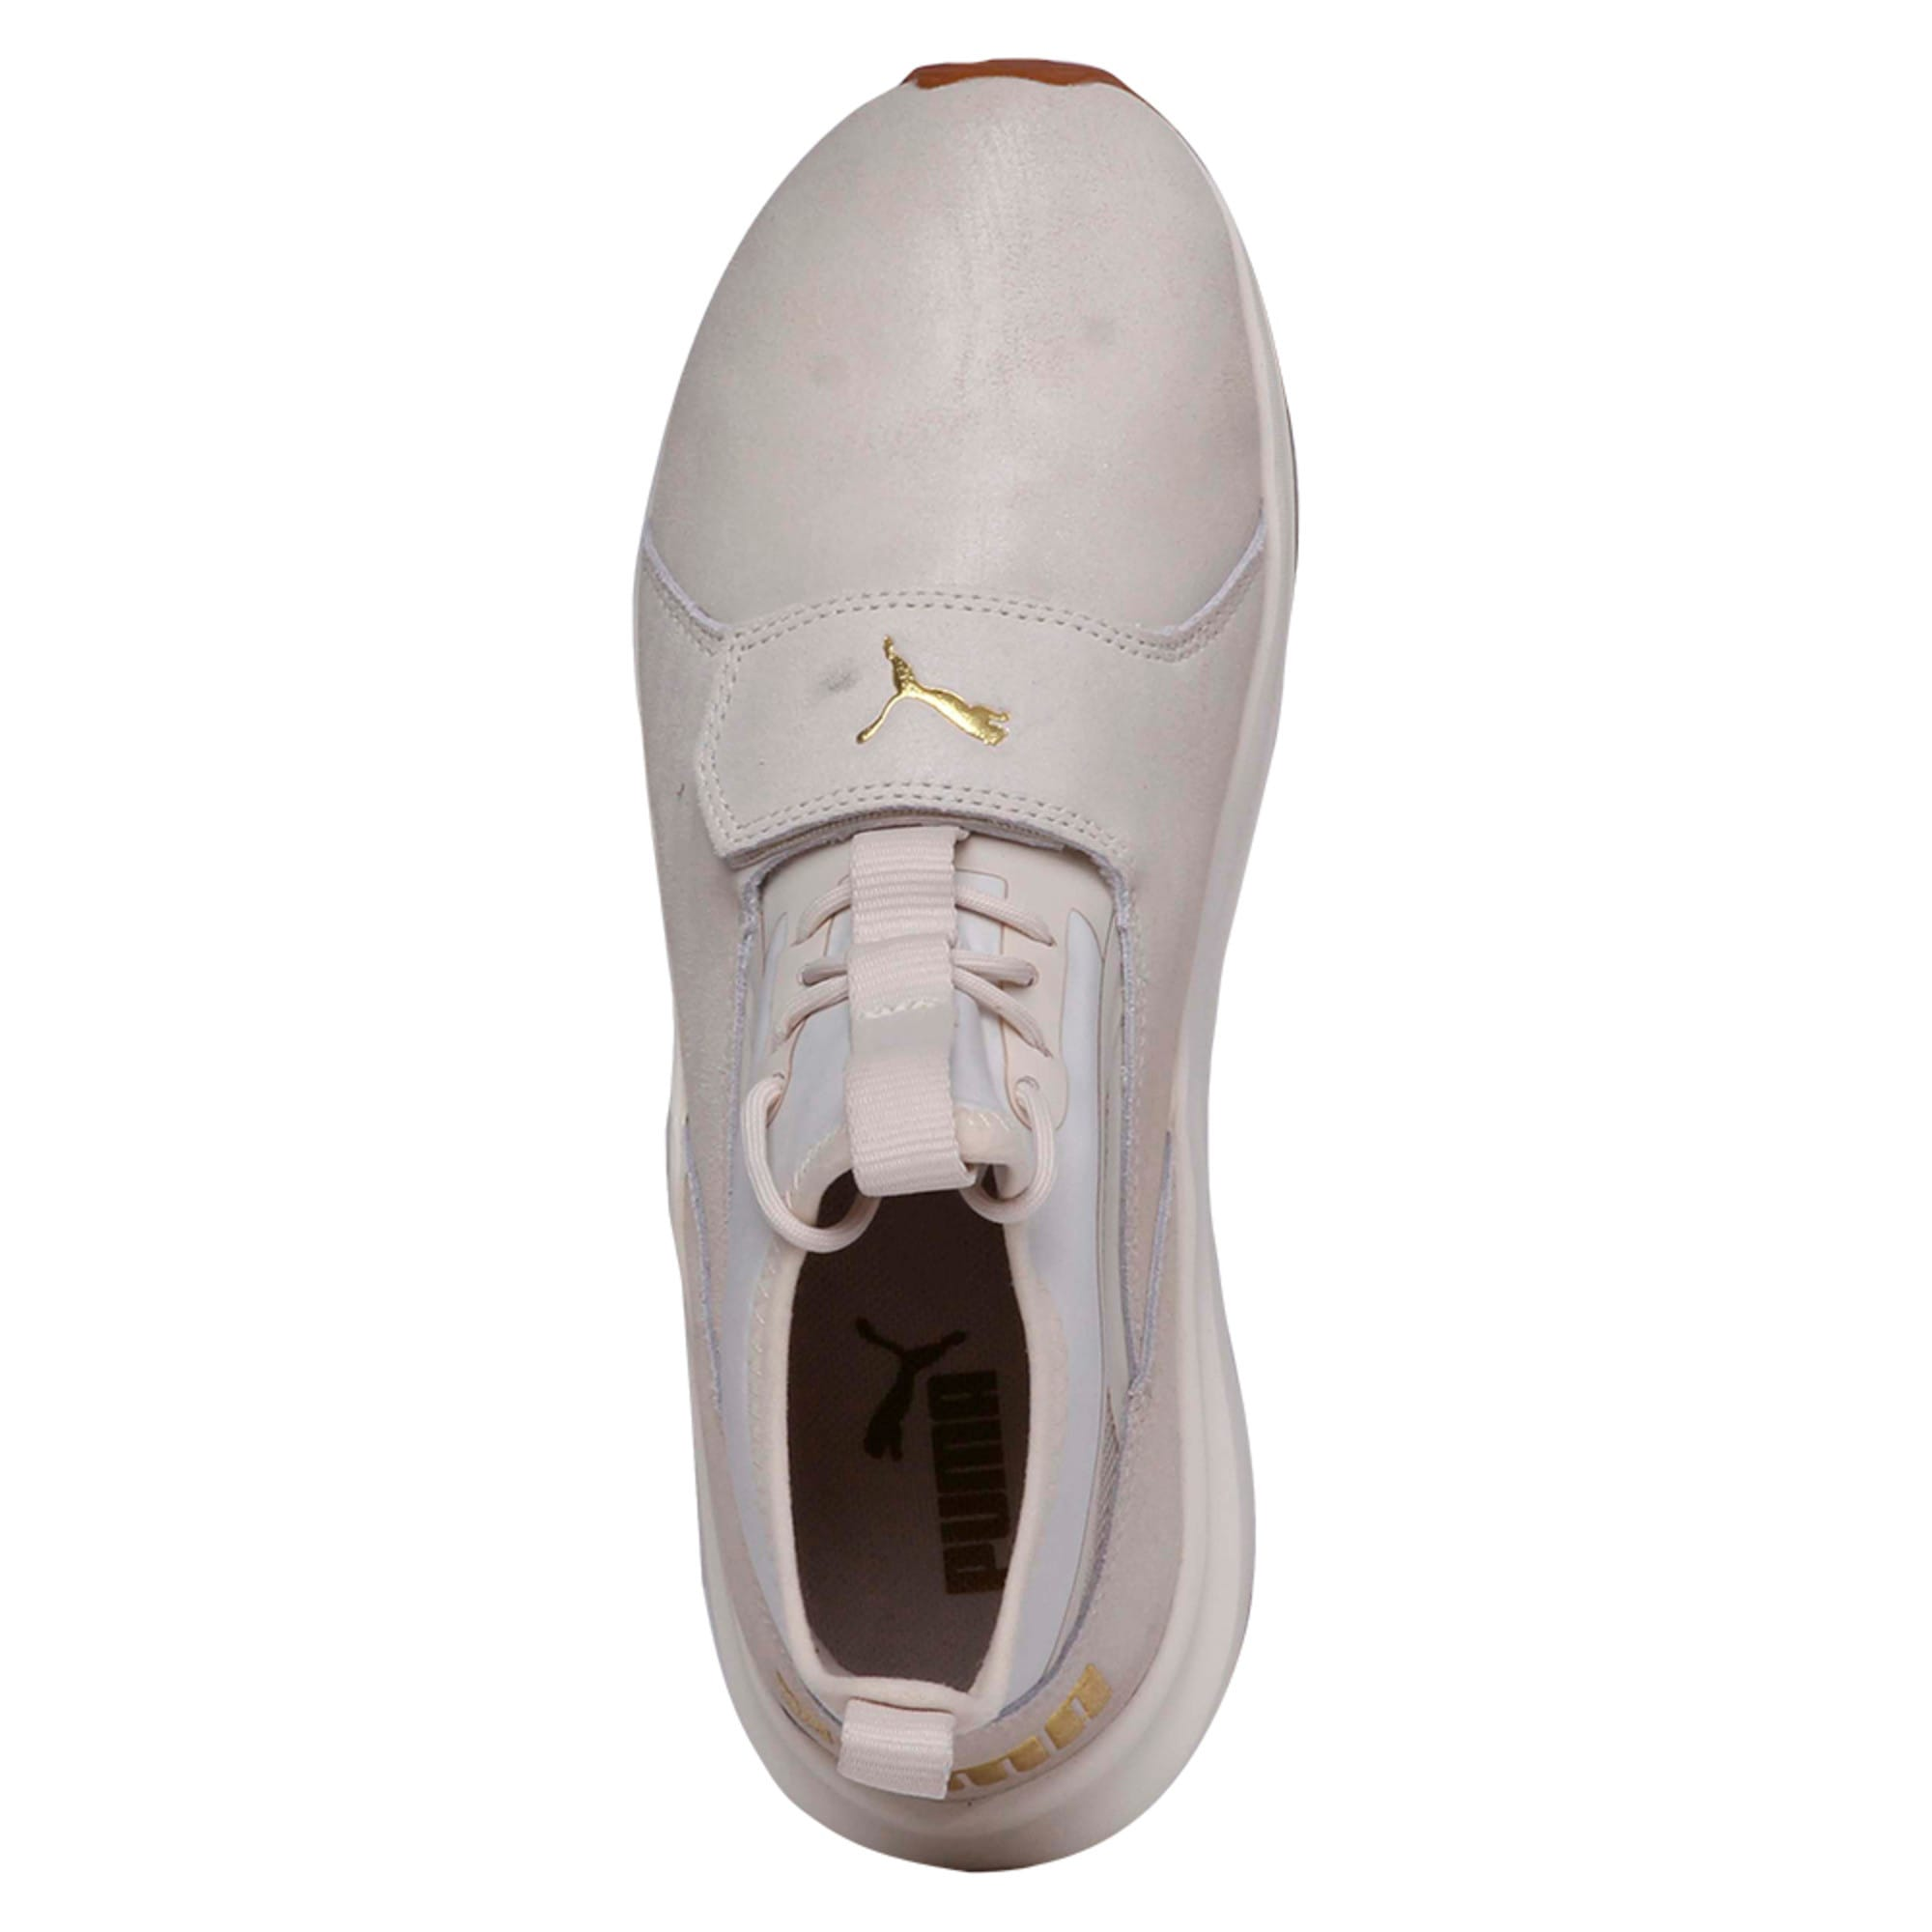 Thumbnail 3 of Phenom Shimmer Women's Training Shoes, Birch-Whisper White, medium-IND